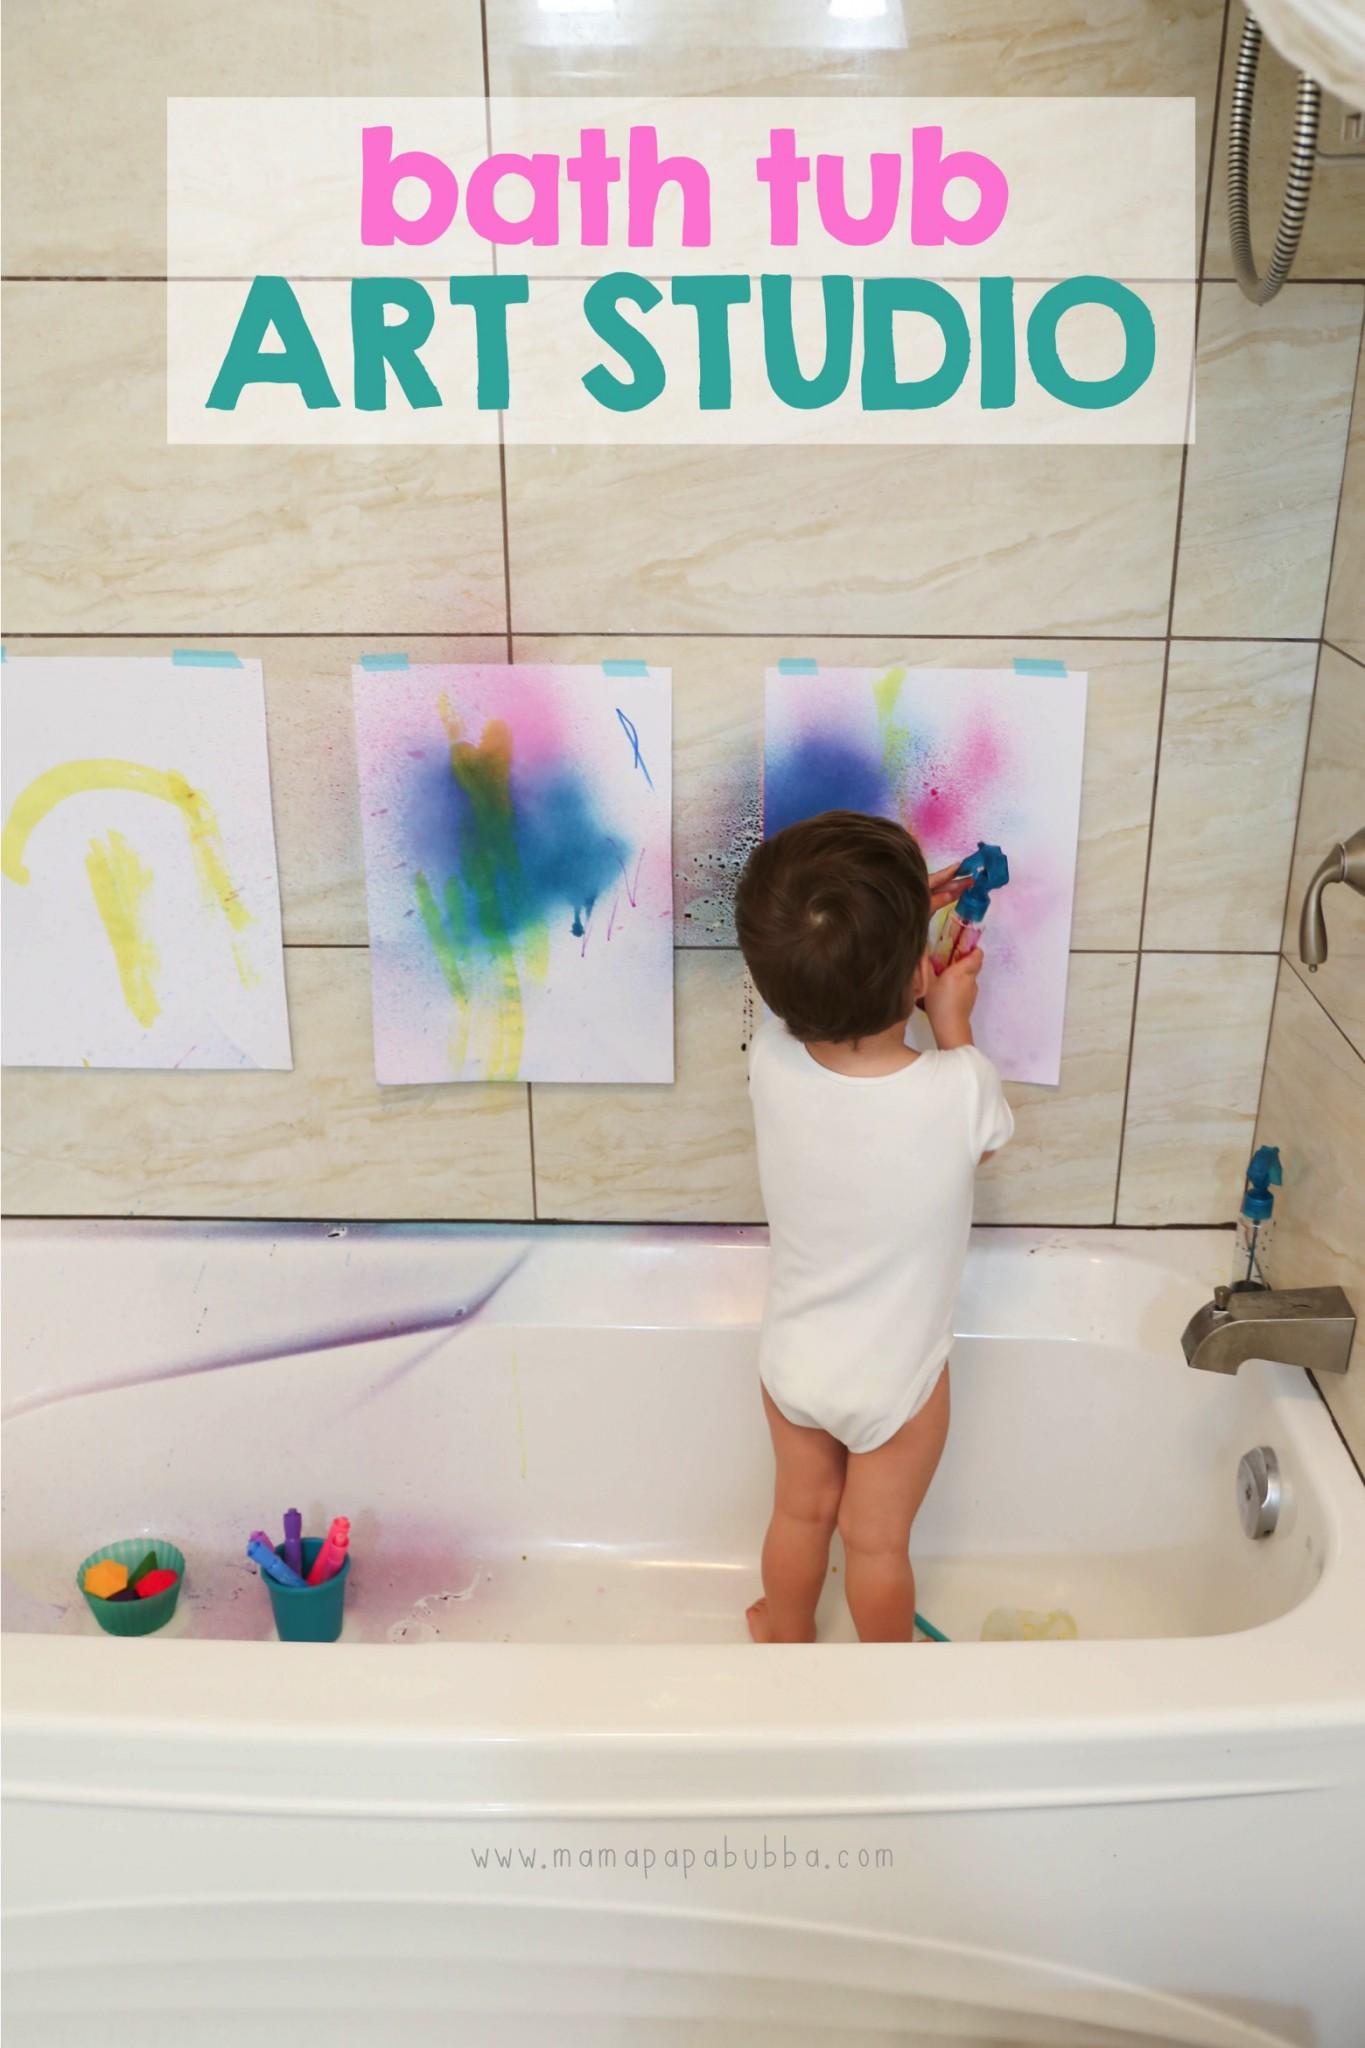 Bath Tub Art Studio | Mama Papa Bubba